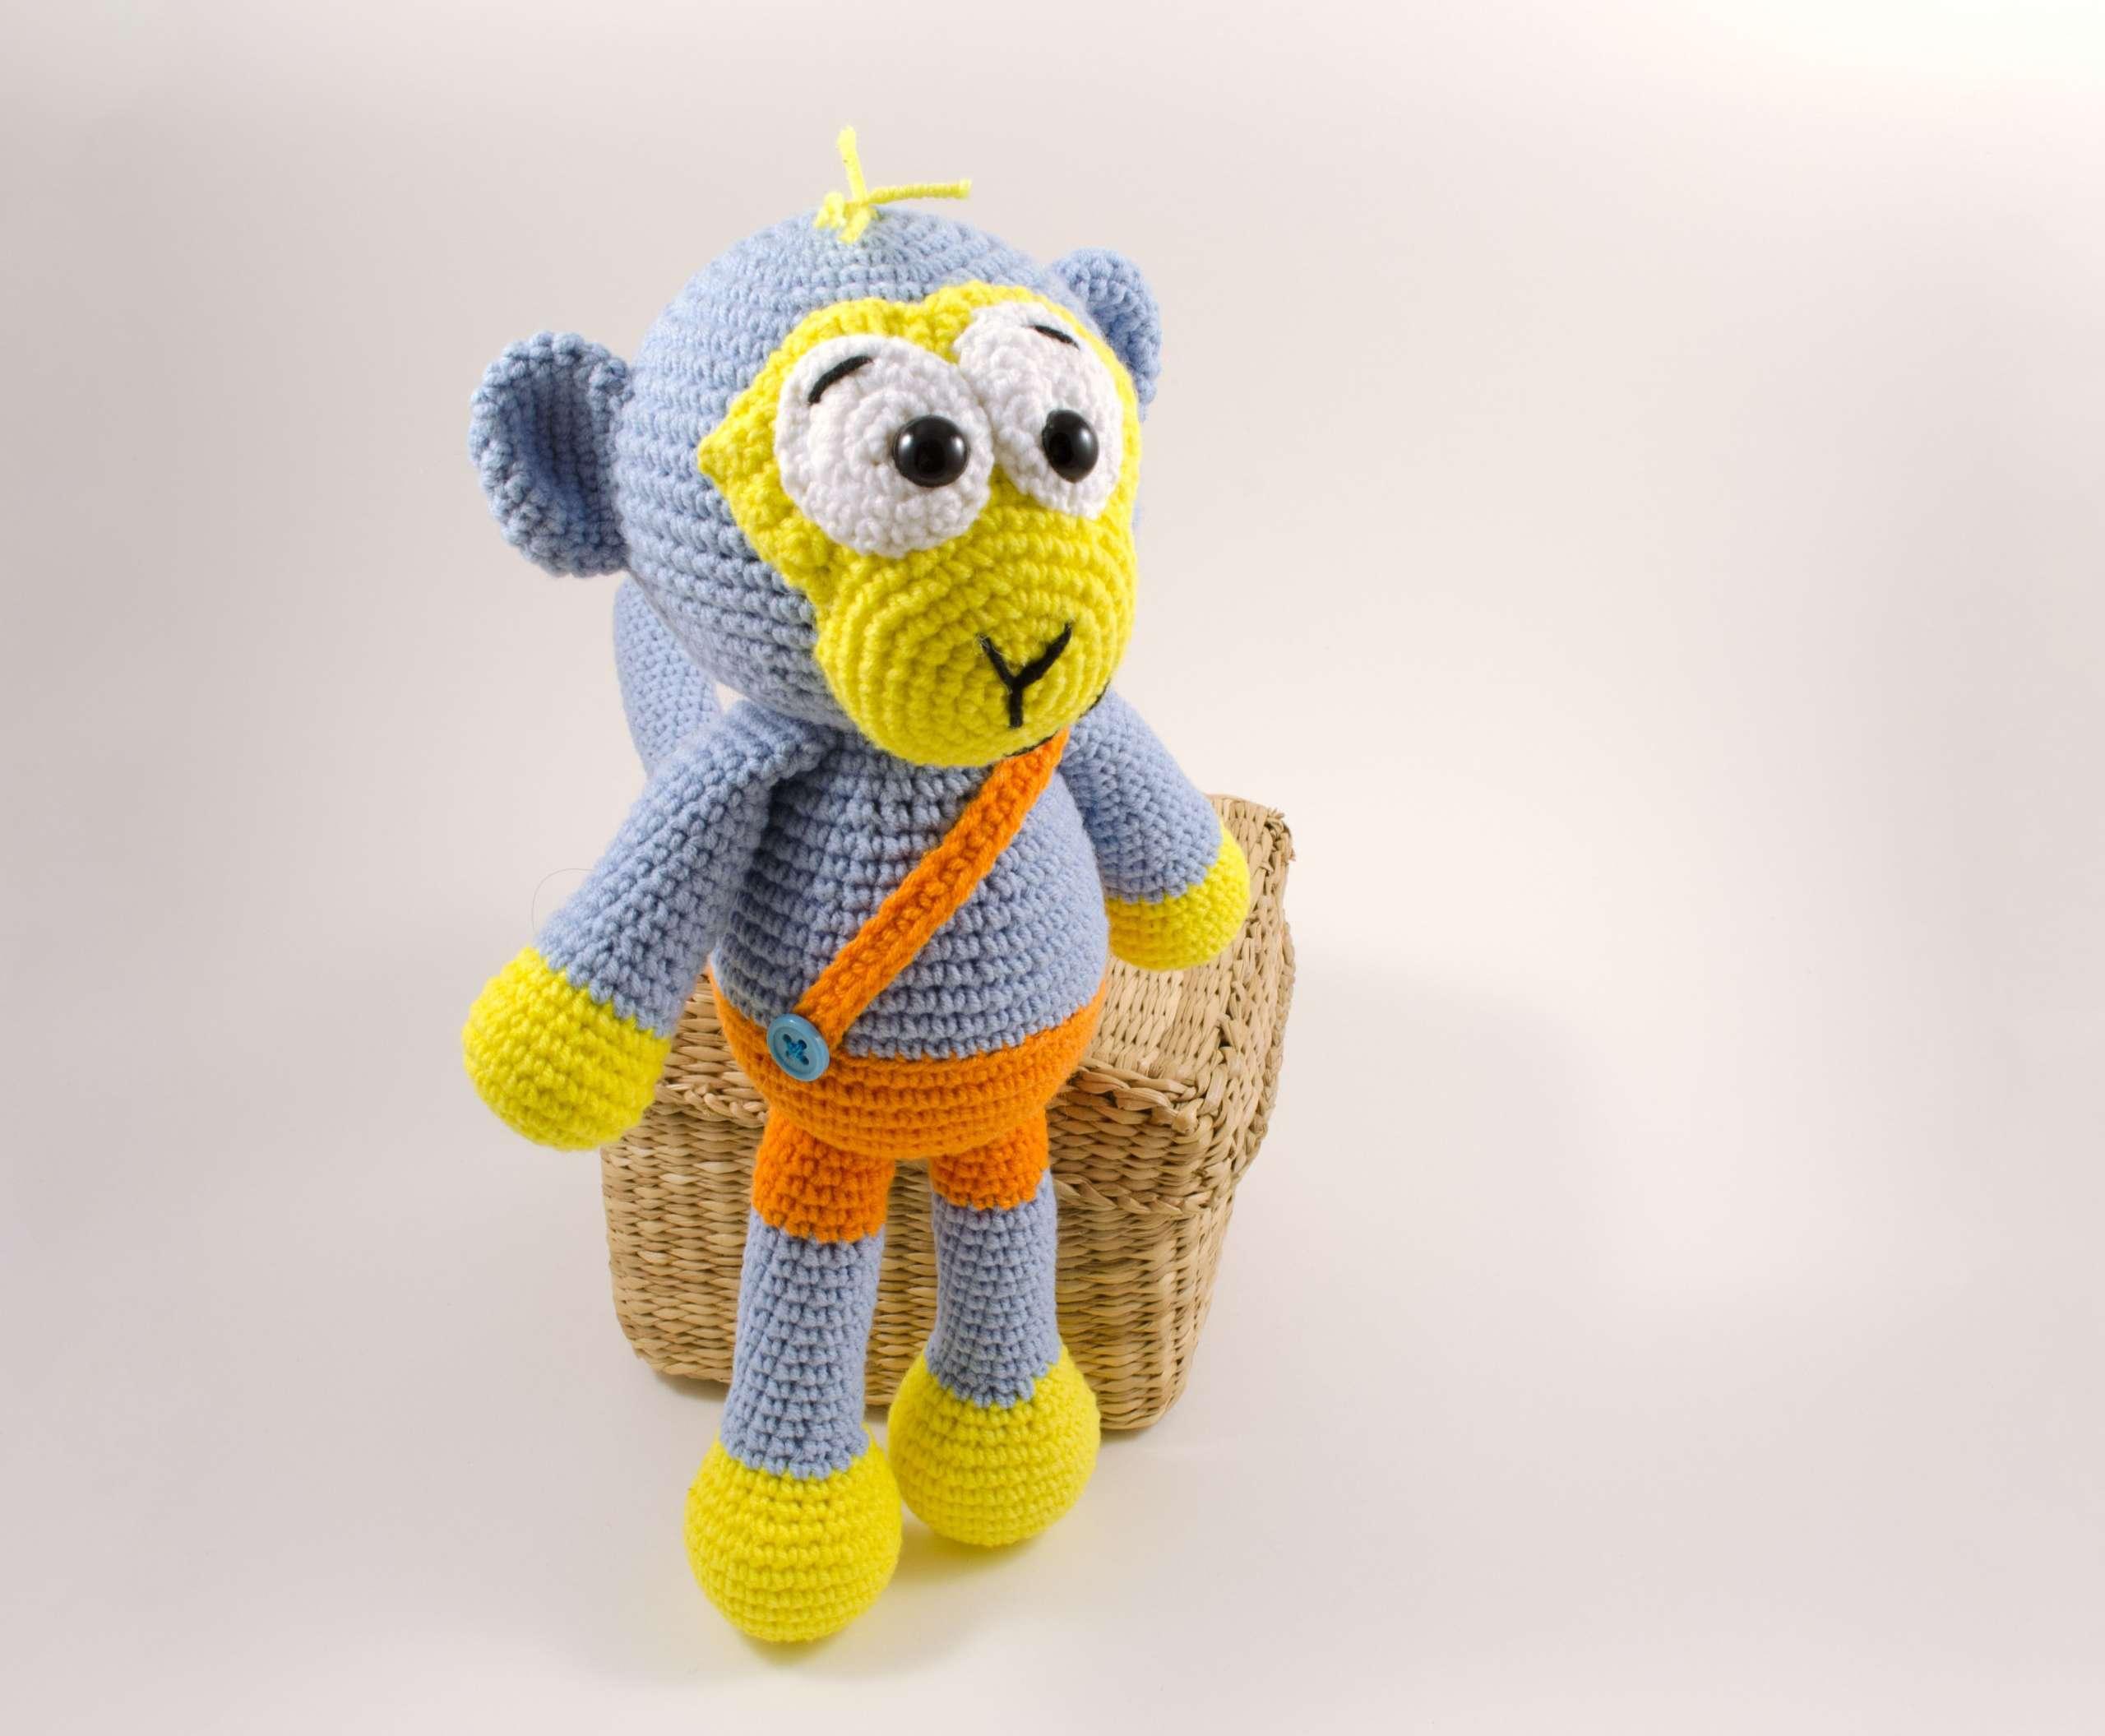 Fancy Design Handmade Crochet Patterns Monkey Baby Doll Amigurumi ...   1583x1920